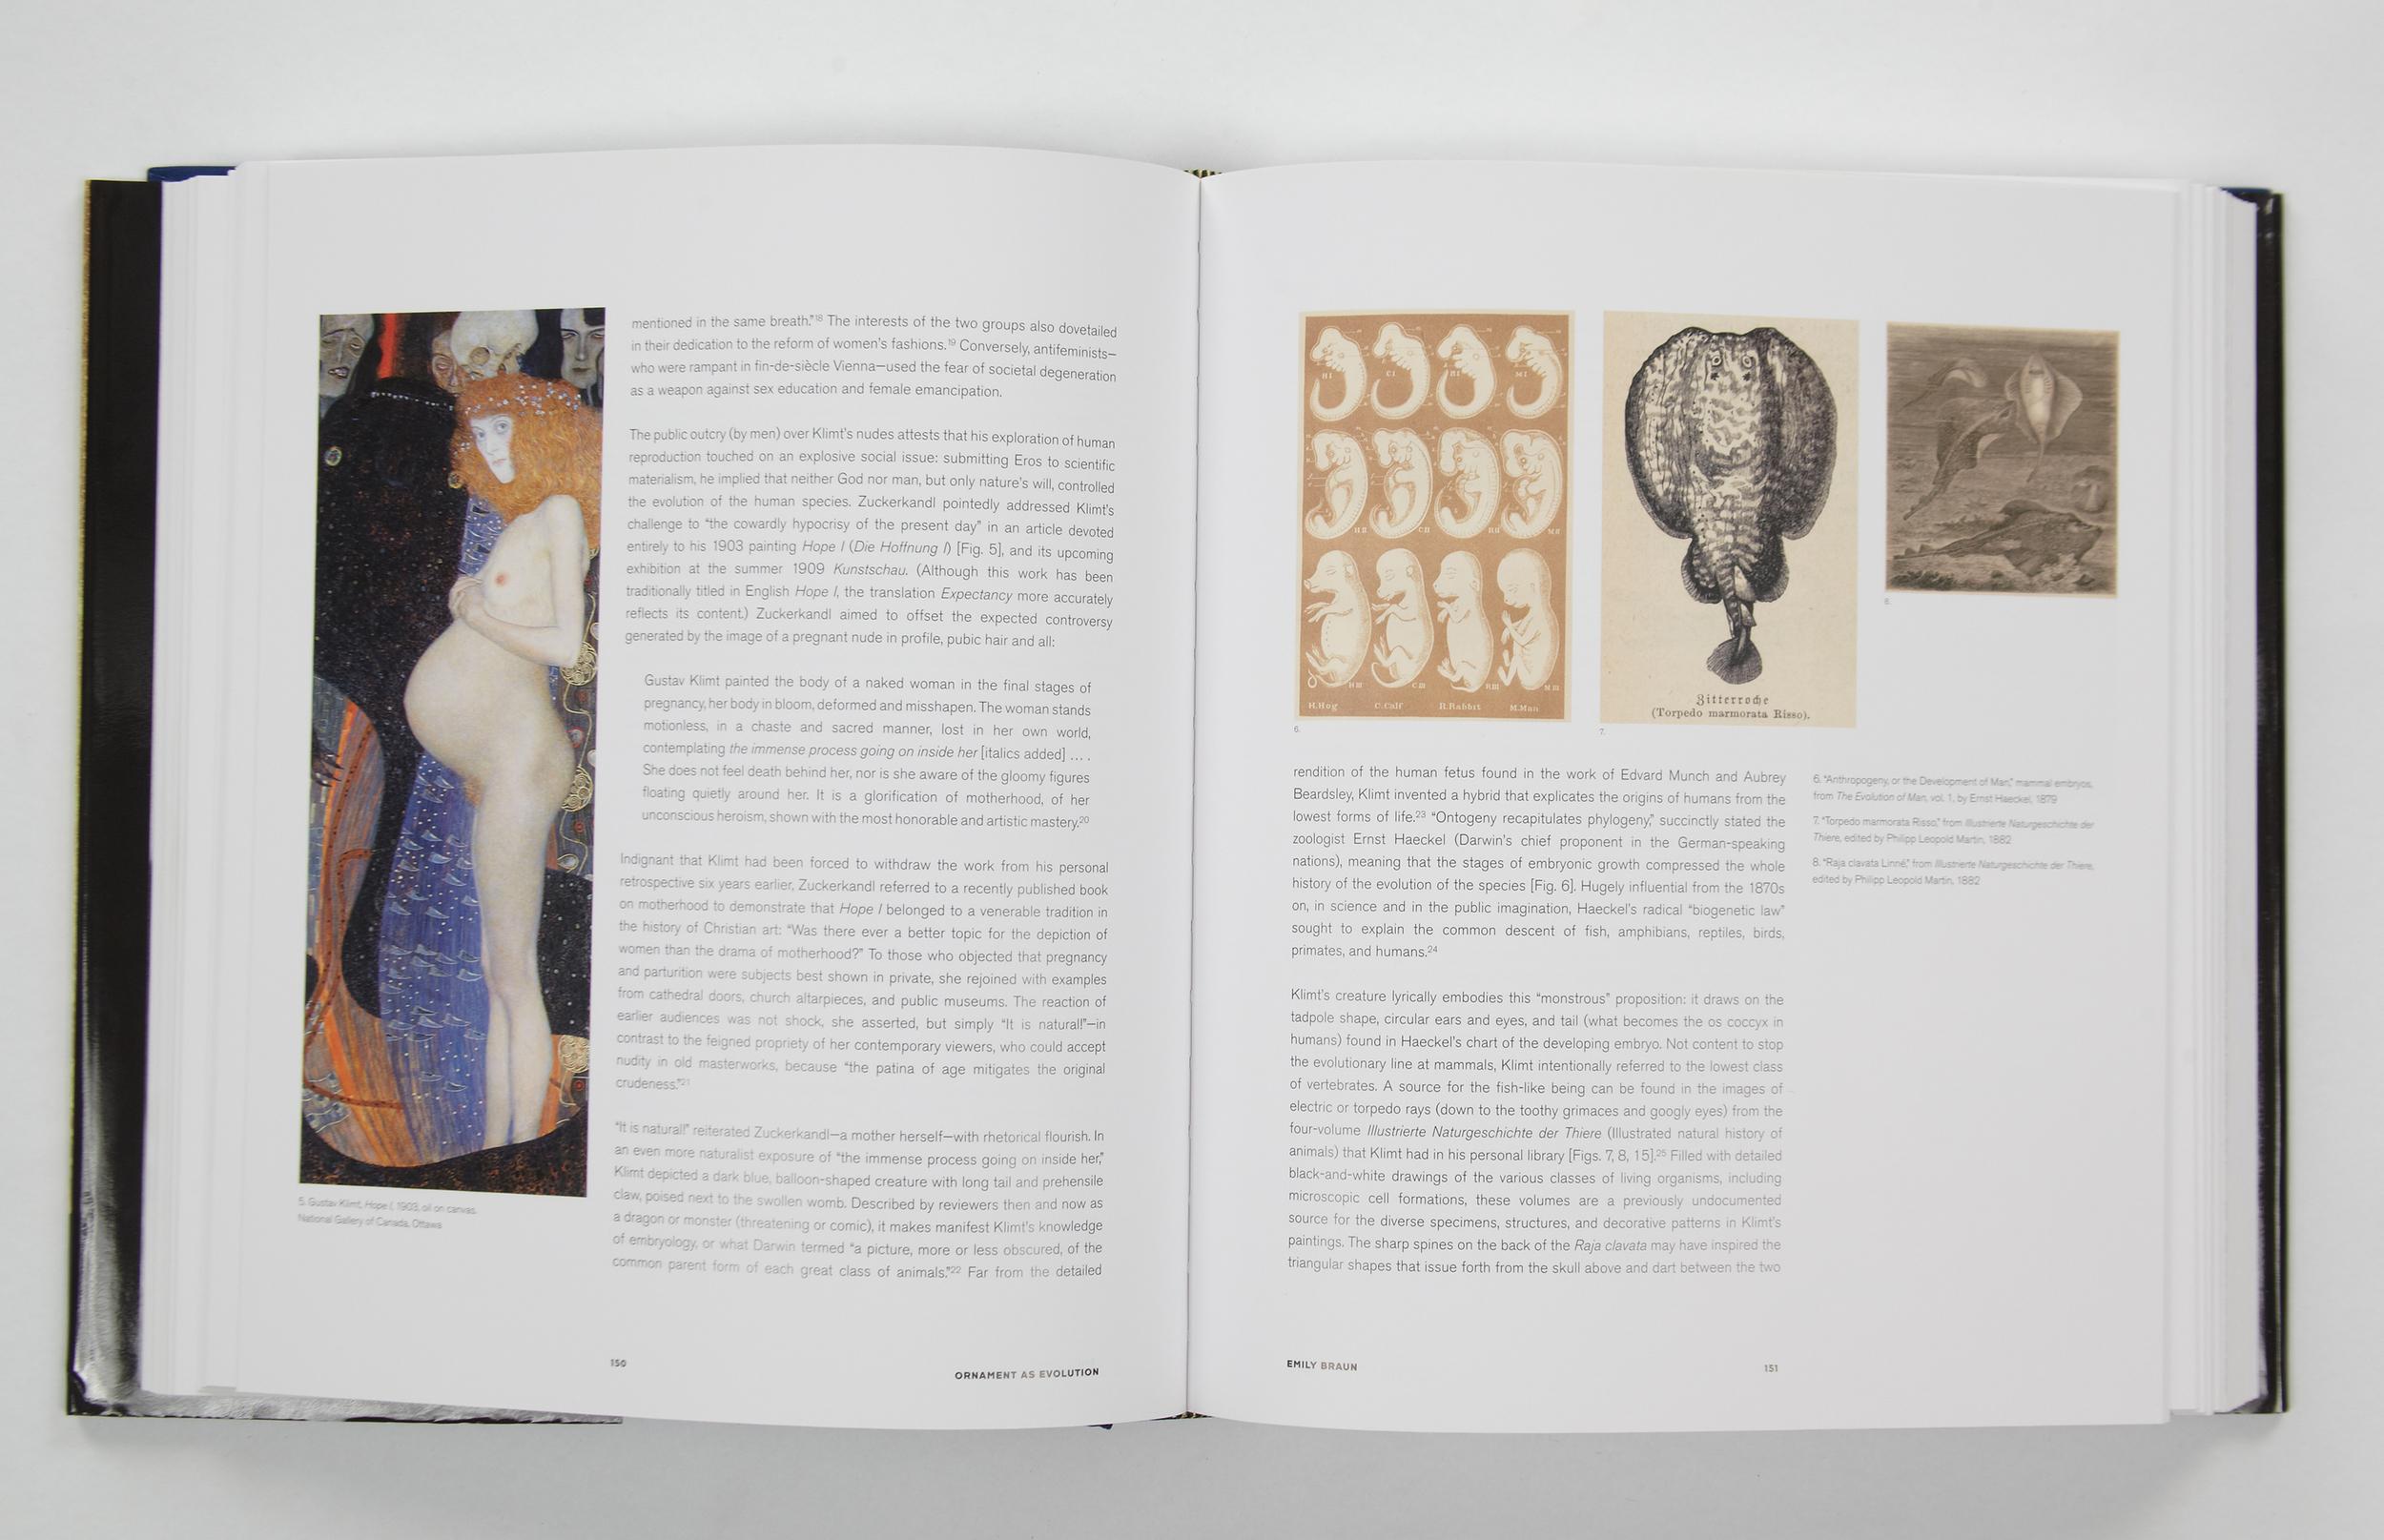 MG_Klimt_bookpost__0008_TSE_Invitations__574.jpg.jpg